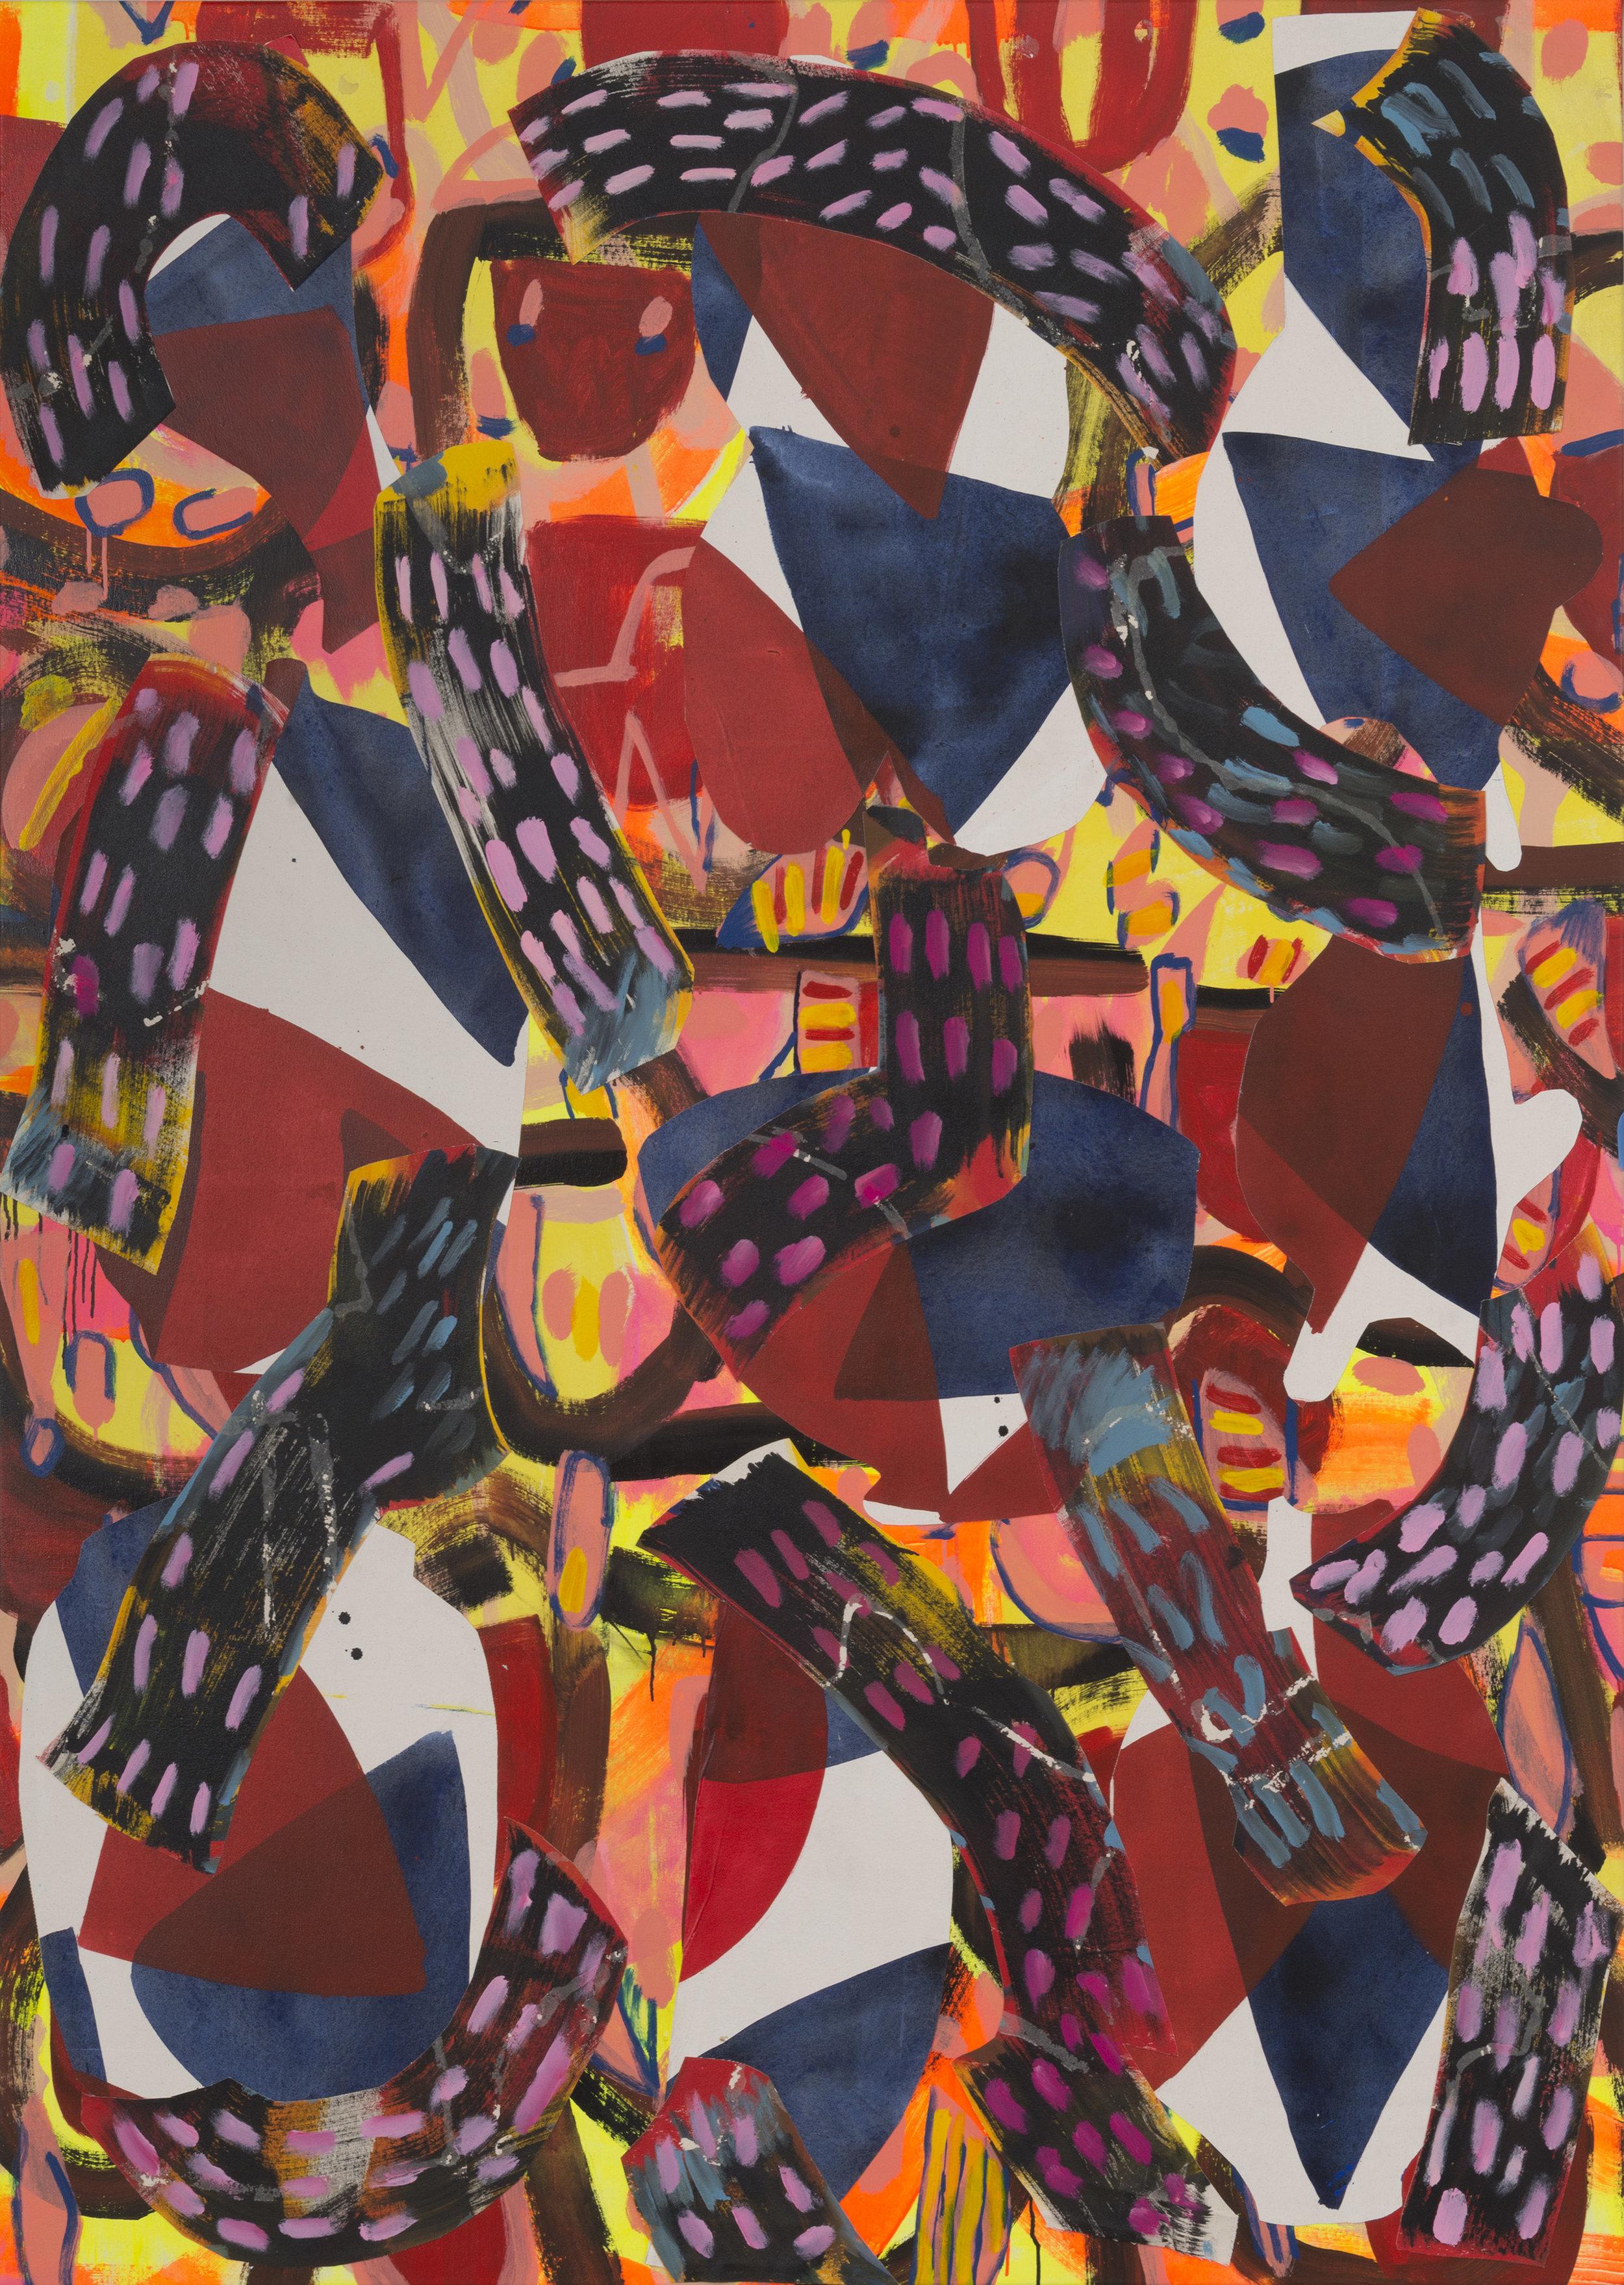 September 19, 2016 / Acrylic, Glue, Canvas / 83 x 64 3/4 inches